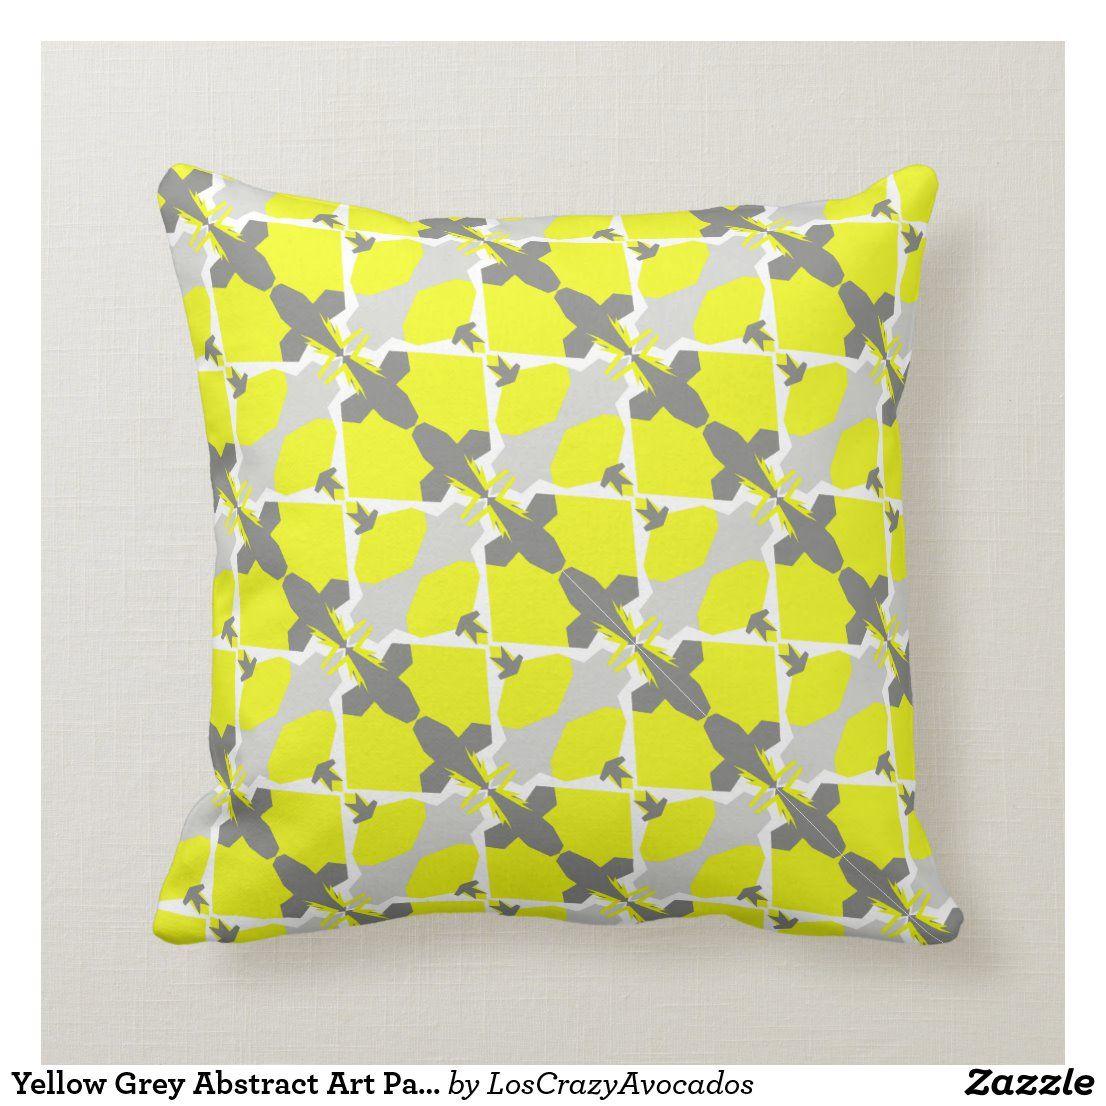 Yellow Grey Abstract Art Pattern Pillow Cushion In 2020 Grey Abstract Art Pillow Pattern Pillows